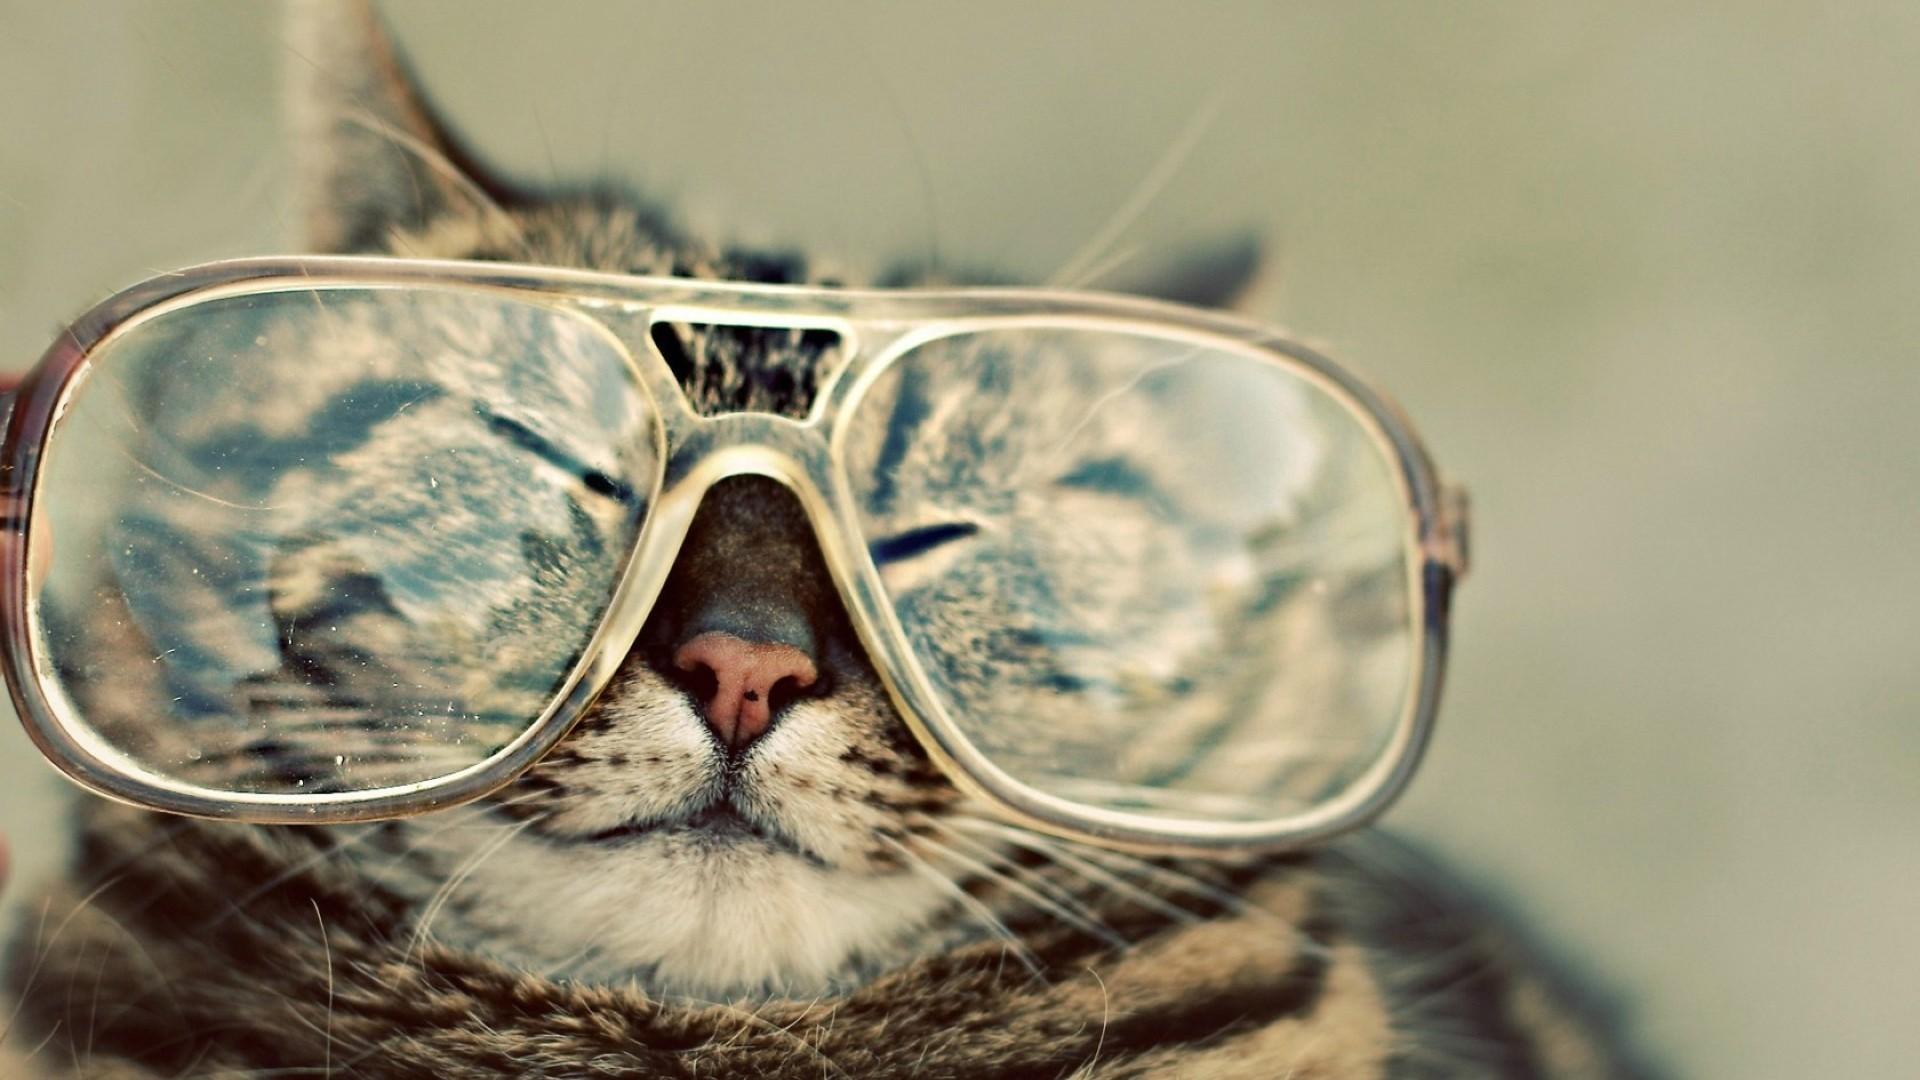 funny animal desktop wallpaper (57+ images)